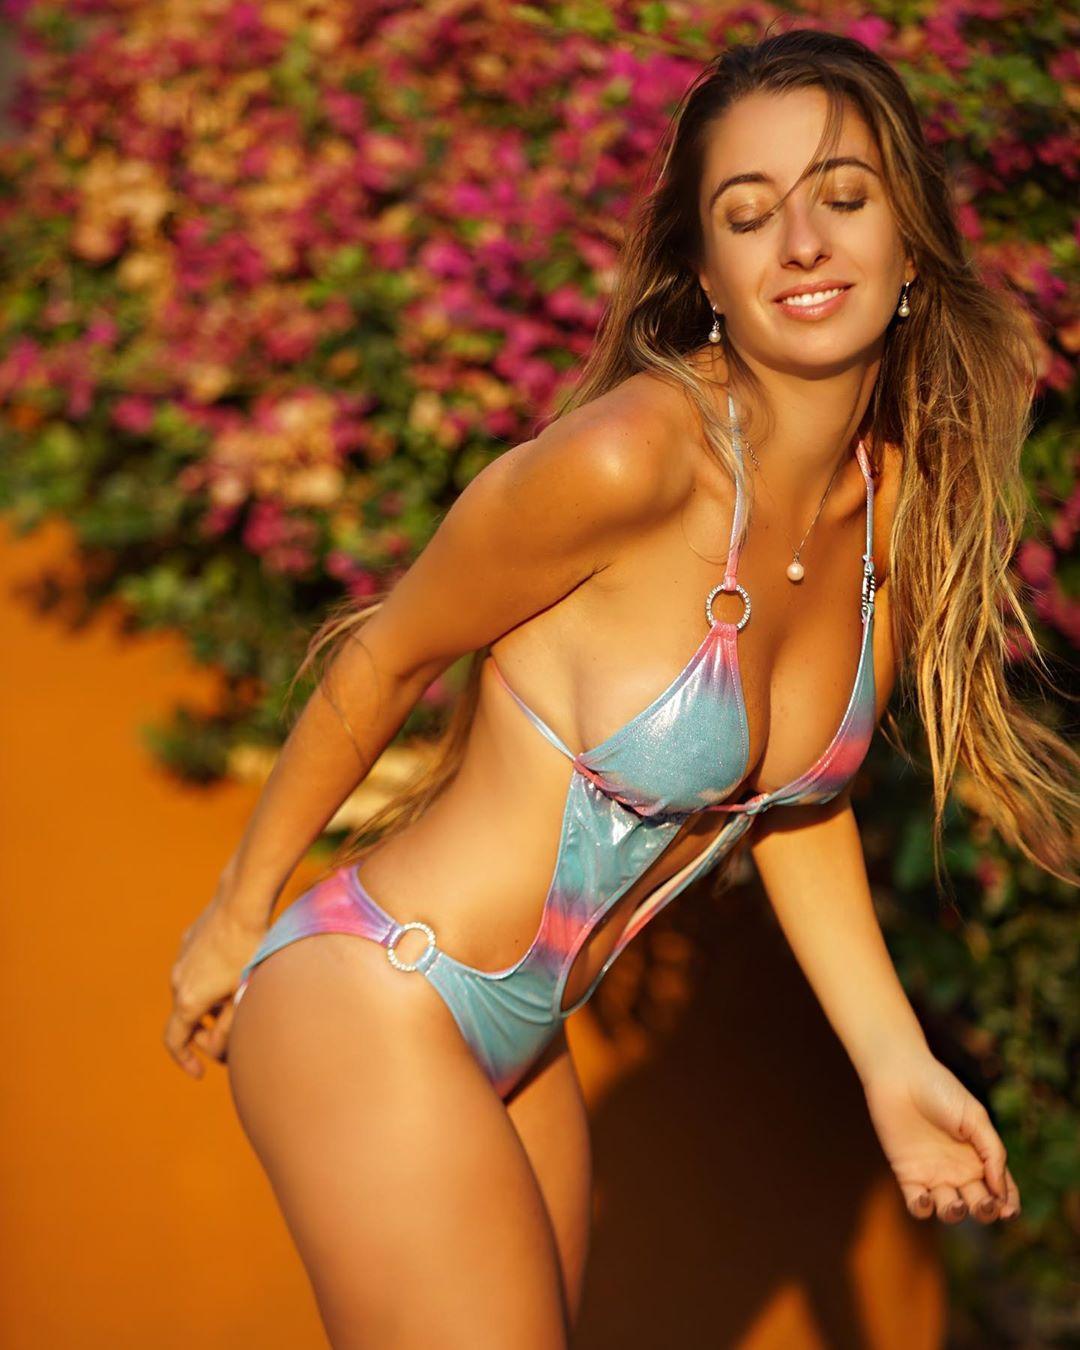 Lauren Francesca hot lingerie pics